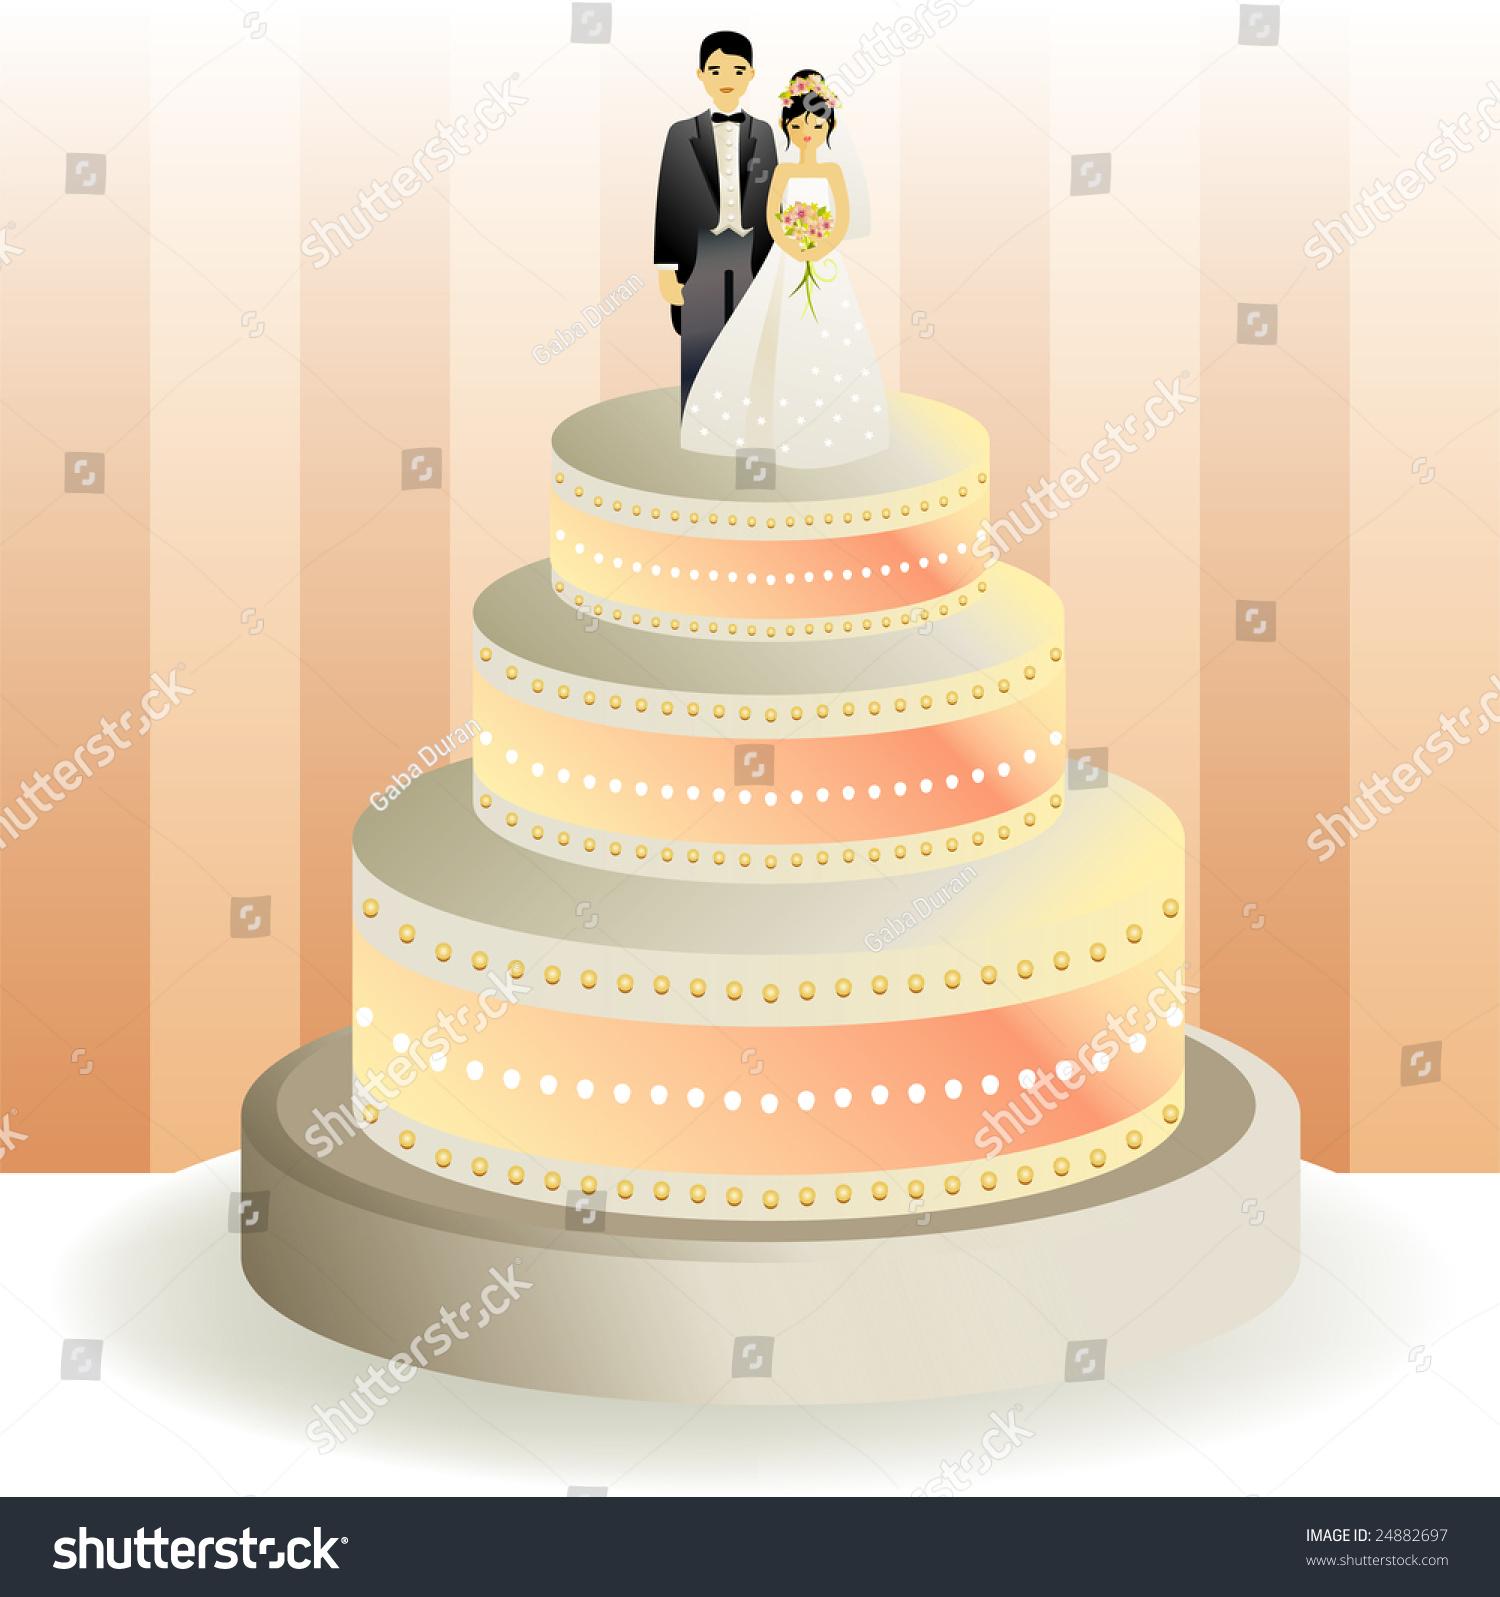 Simple Three Levels Wedding Cake